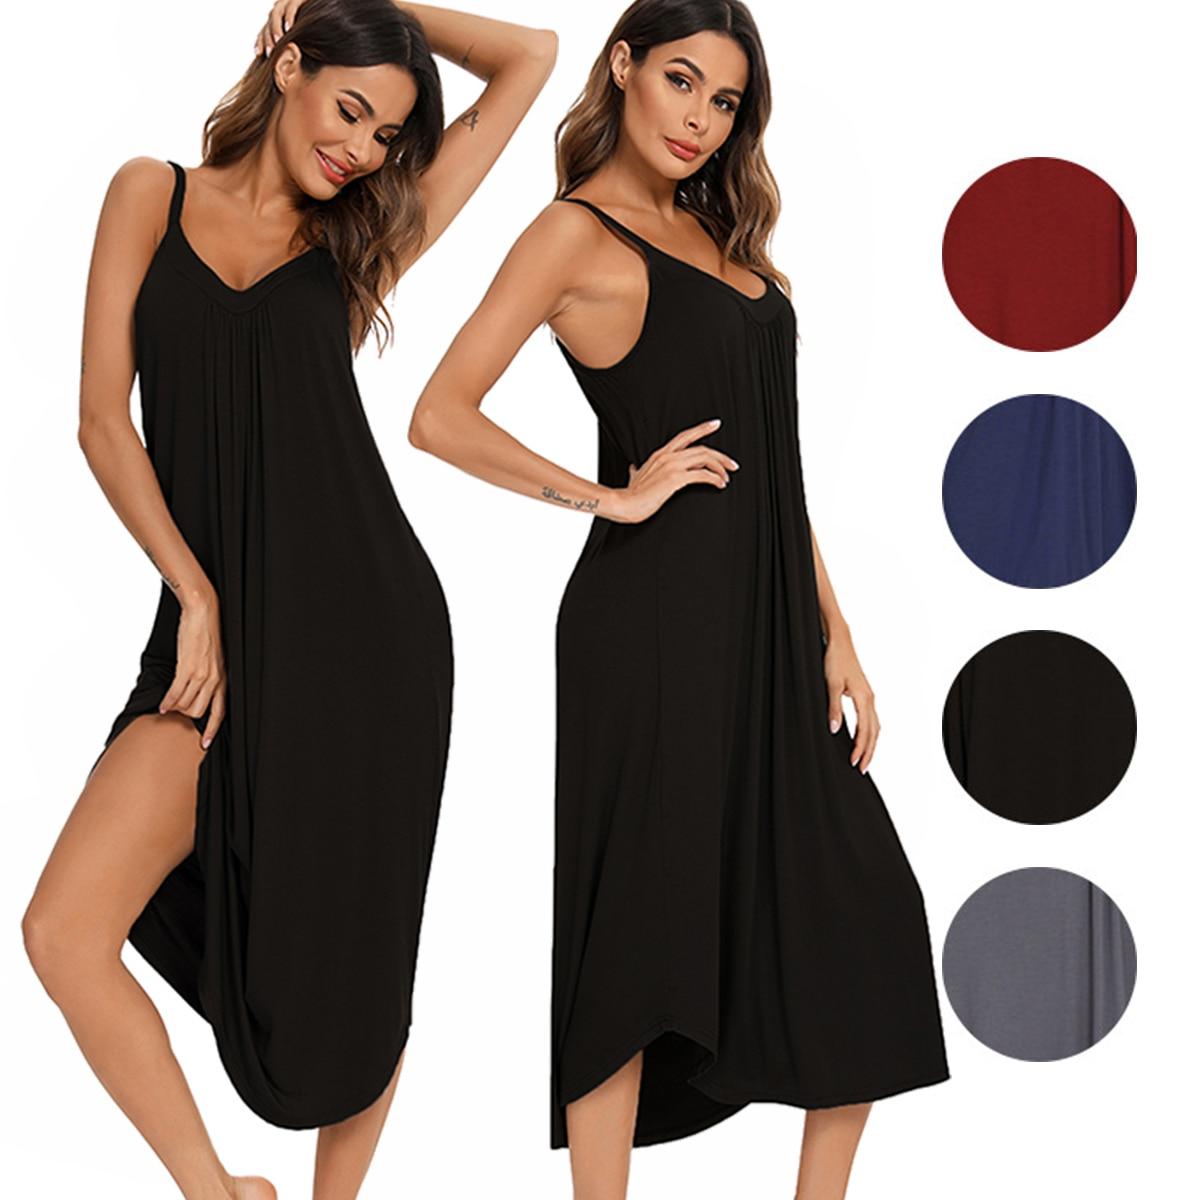 Women Long Sexy Nightwear Modal Sleepwear Spaghetti Strap Nightgowns Sleepshirts Plus Size Nightdress Lingerie Home Cloth Dress